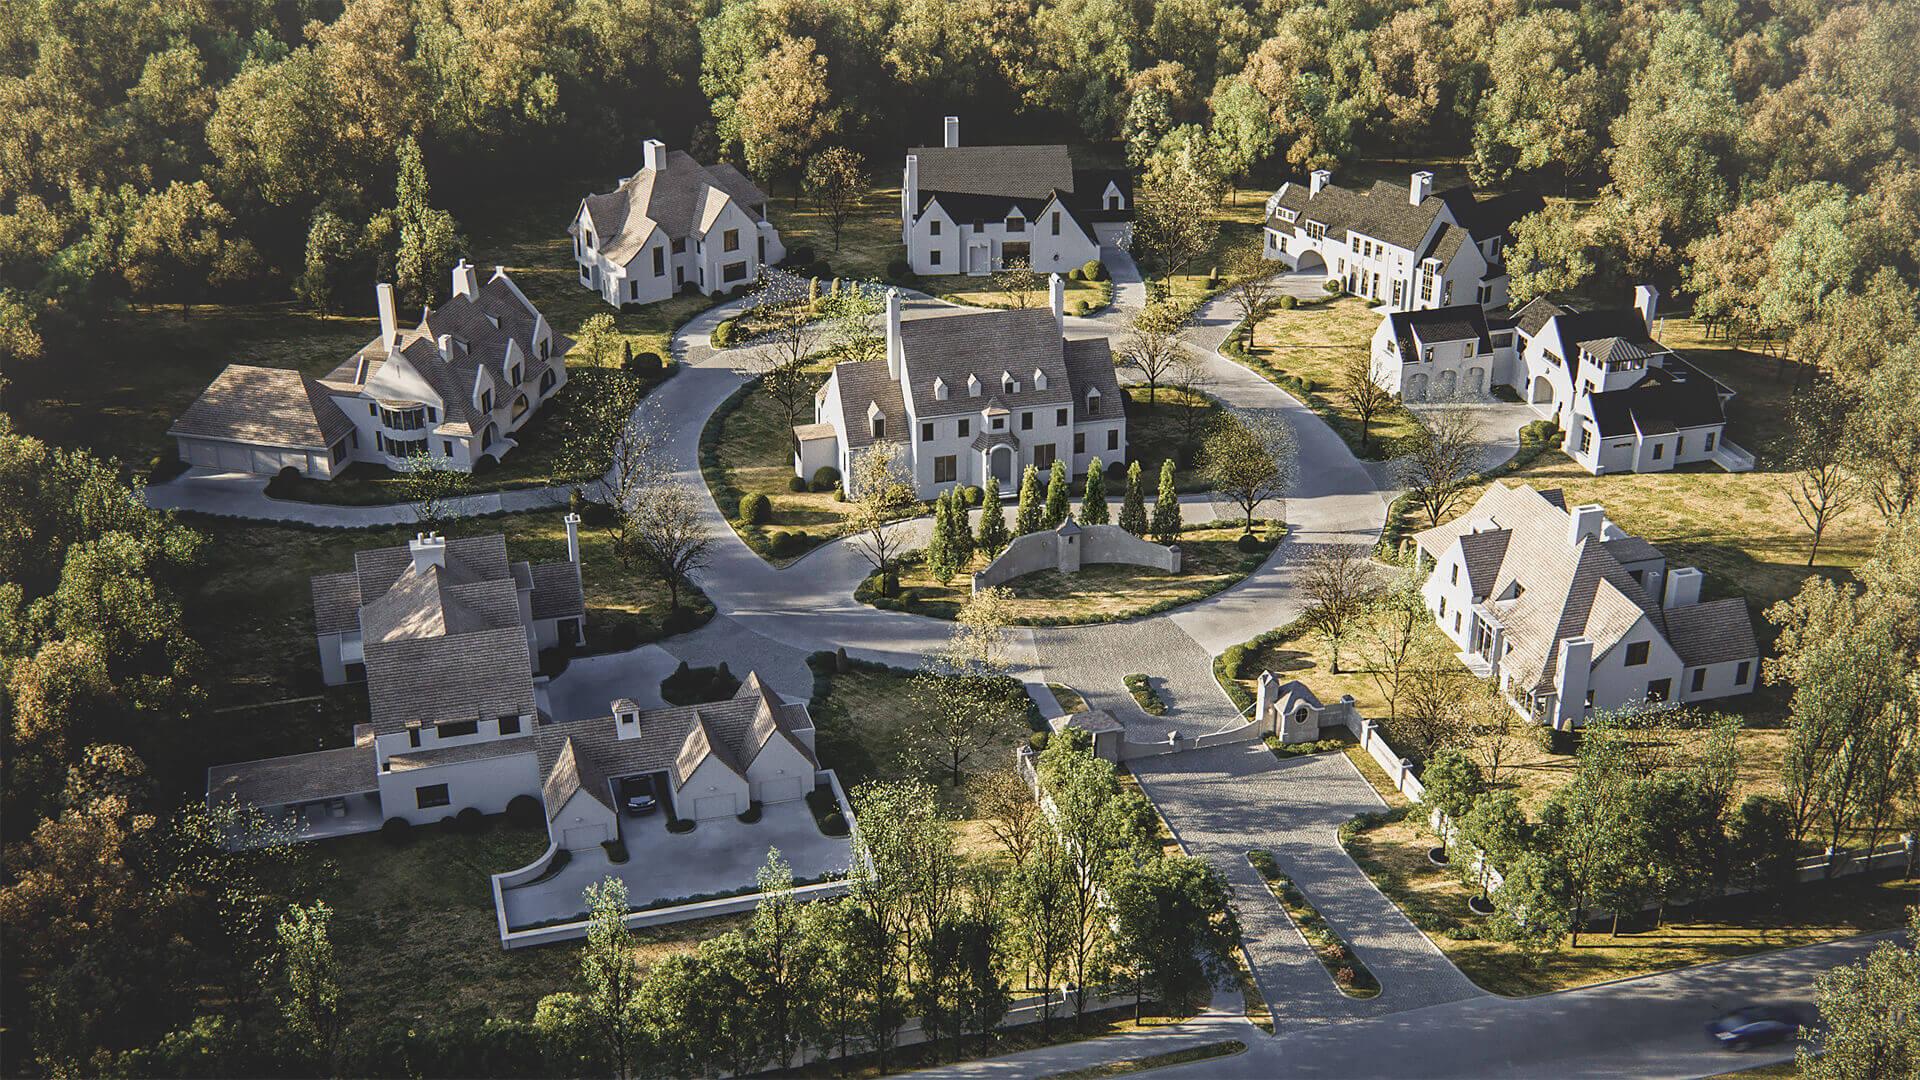 Photoreal 3D Render Of A Cozy Neighbourhood